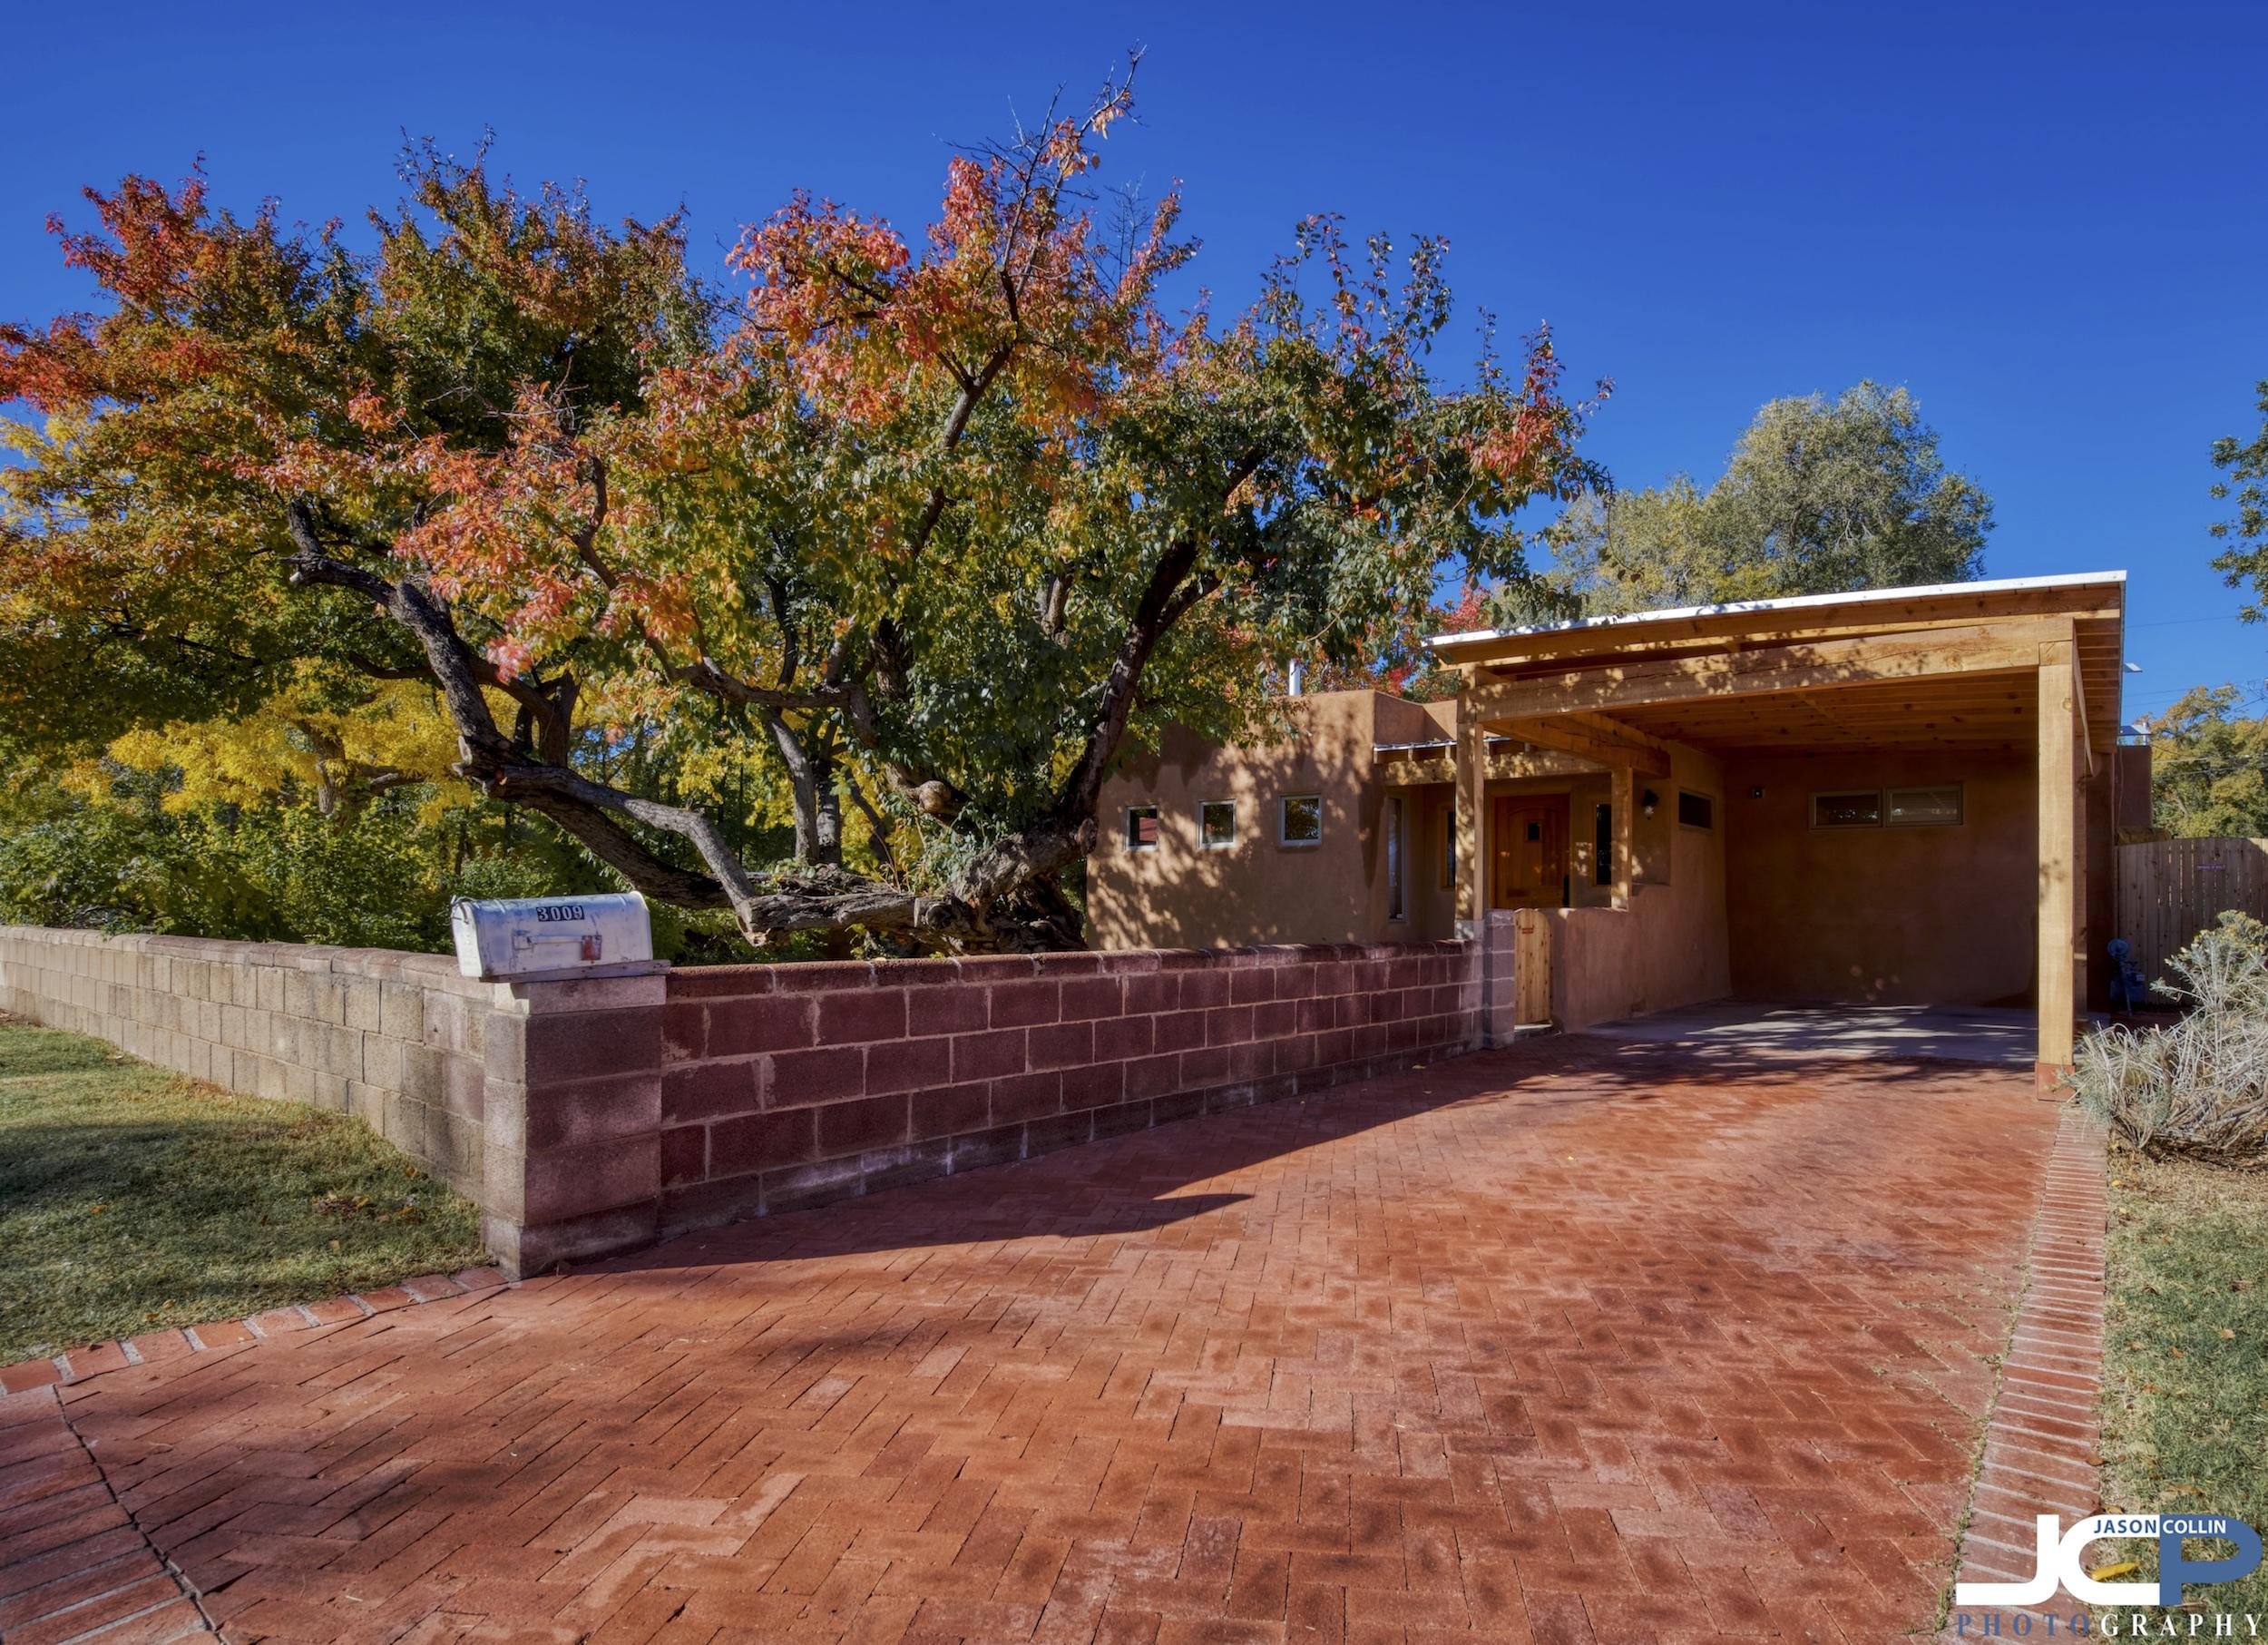 A unique home in Graceland Acres - Albuquerque Real Estate Photography